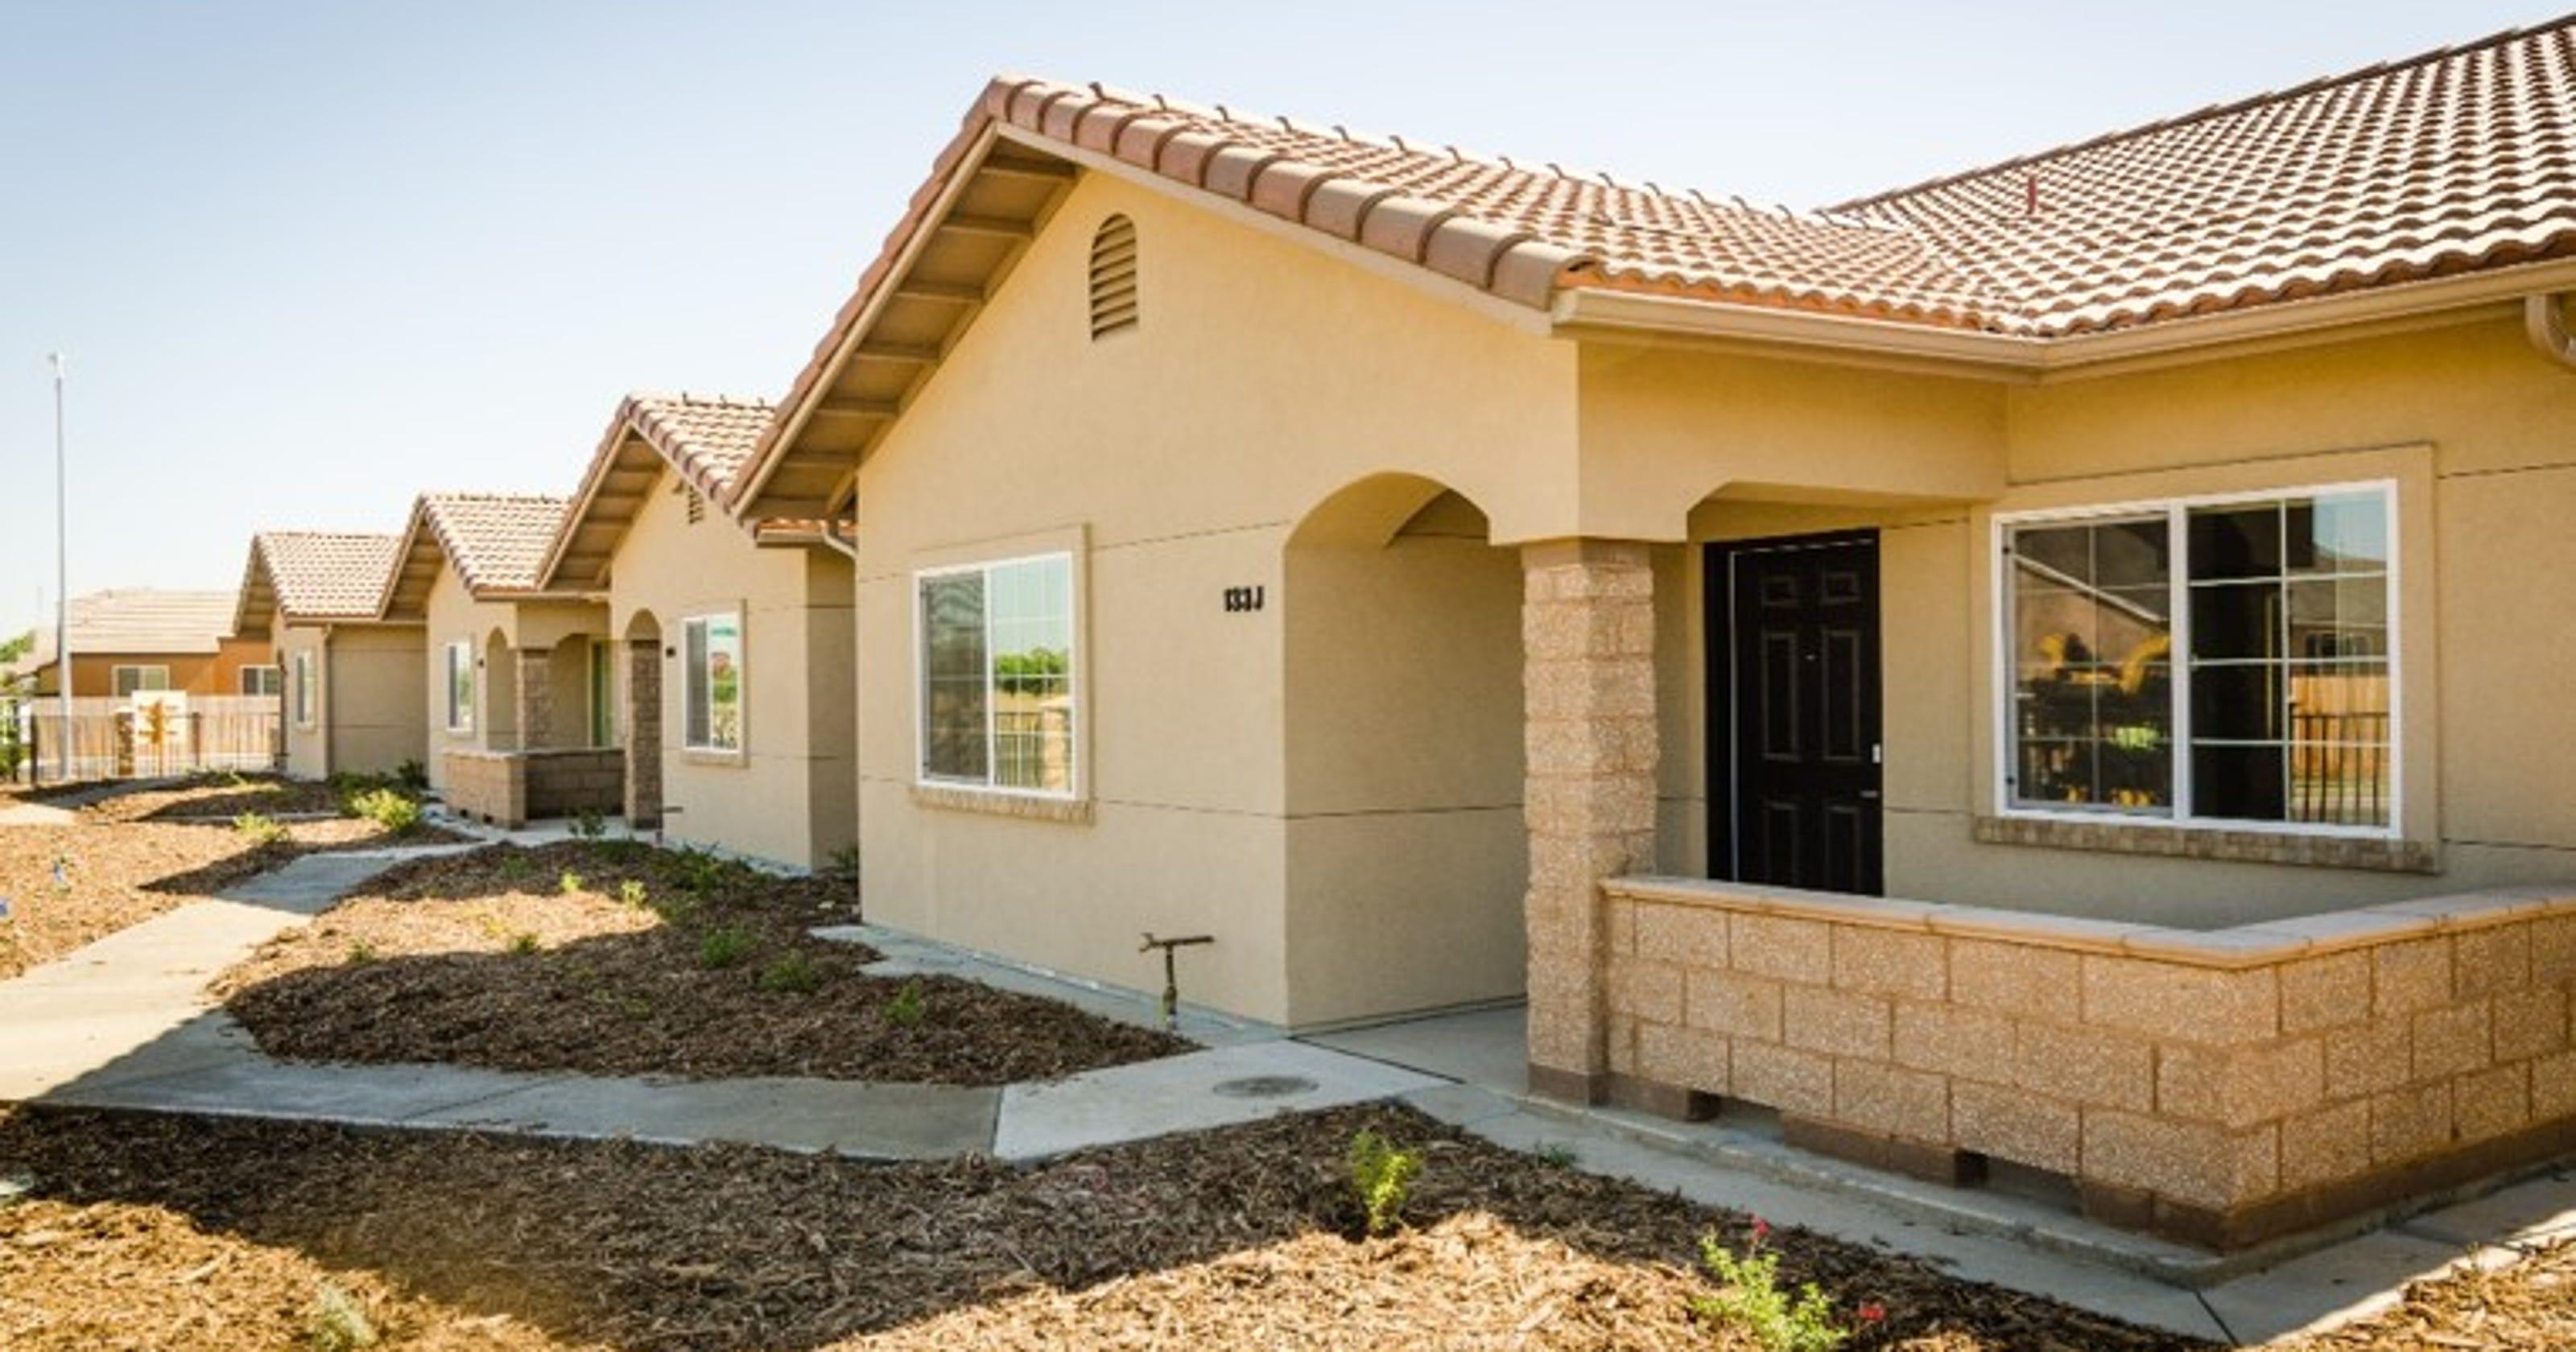 More low-income housing for Visalia